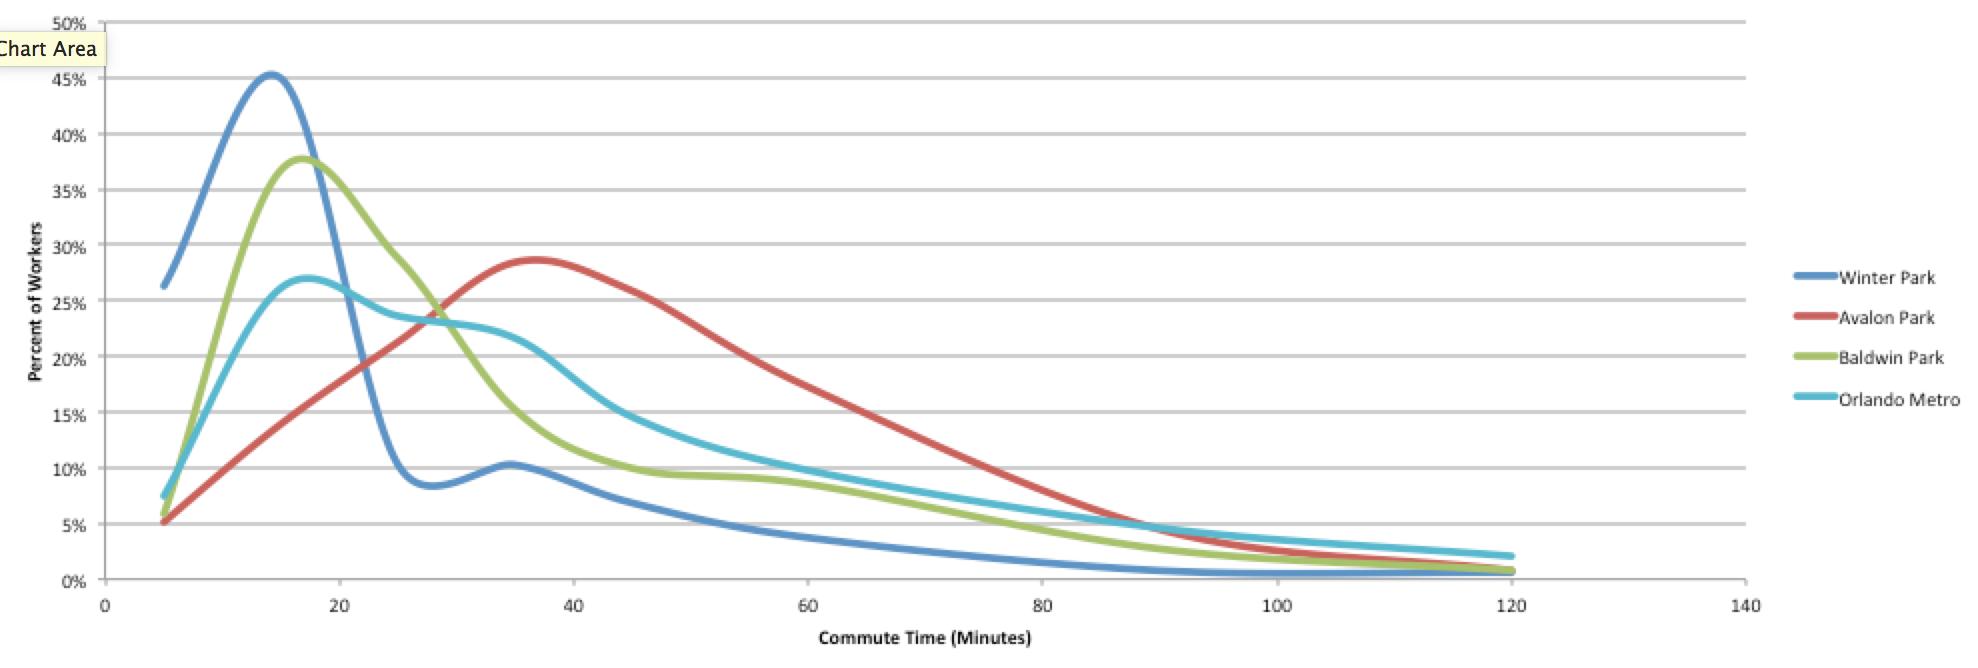 Data source: ACS 2015 5-year estimates